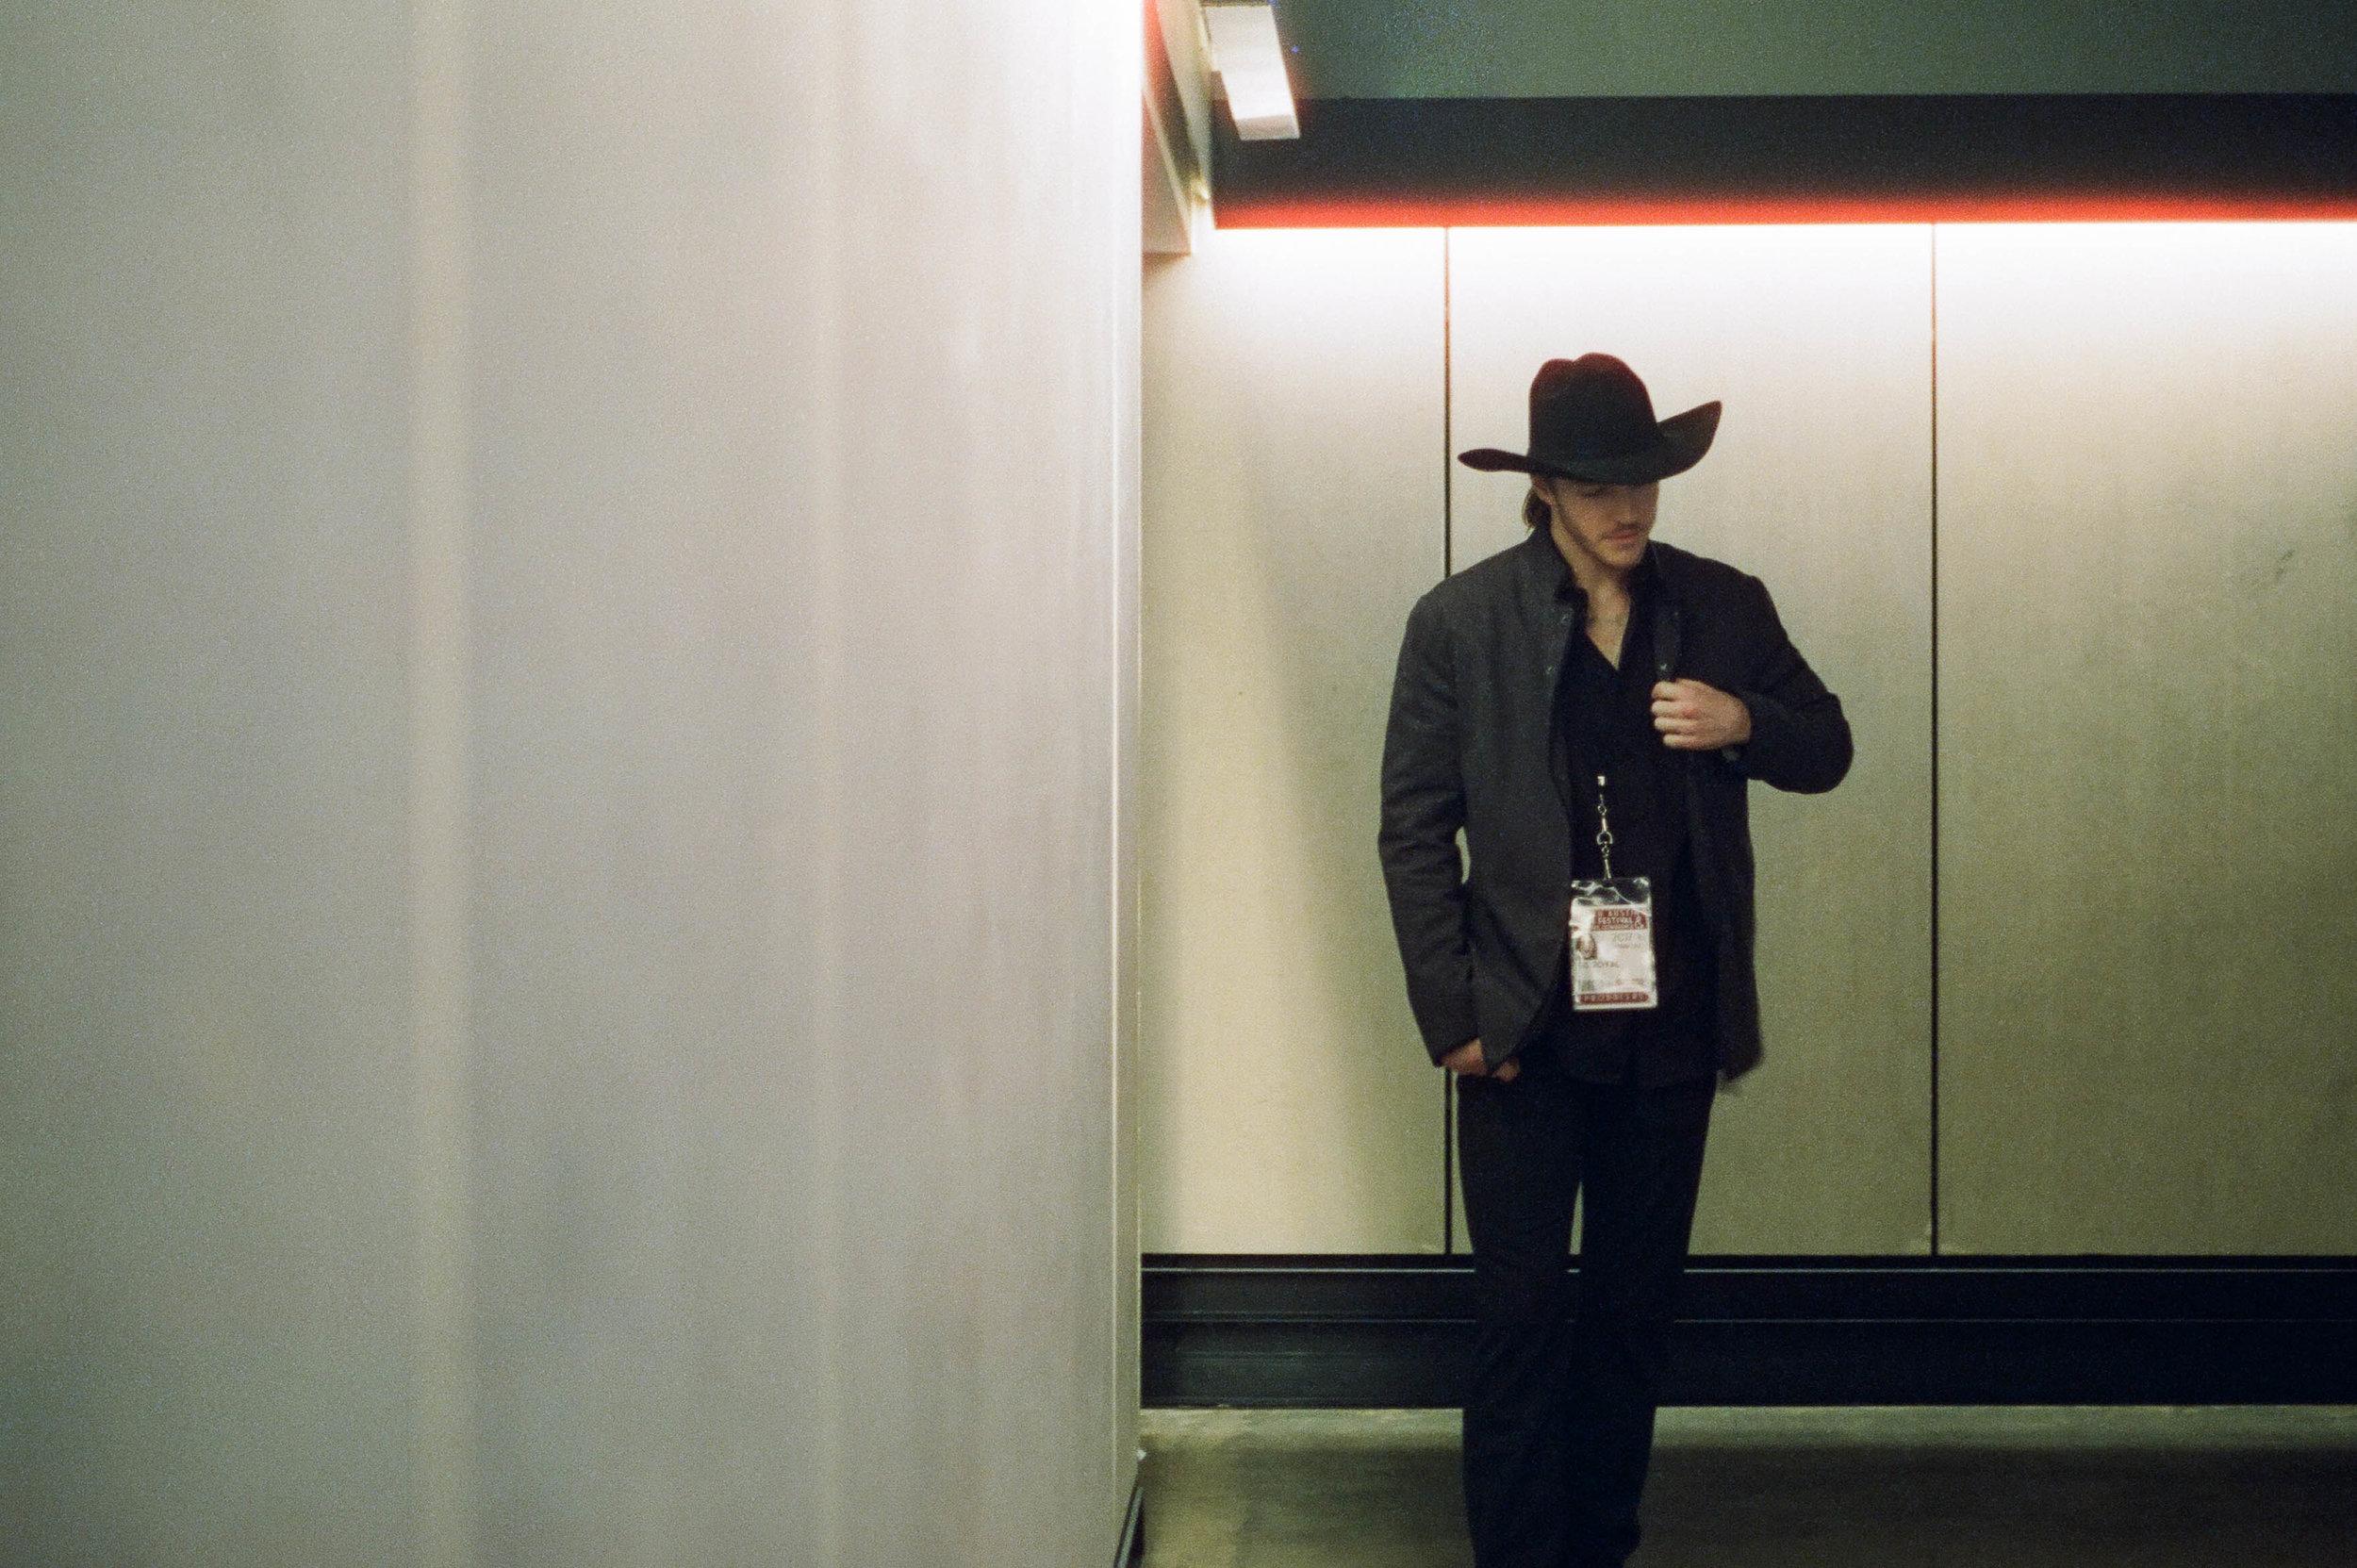 FILM-Southern-Tale-Austin-Film-Fest-Kirby-Gladstein-2017-024.jpg